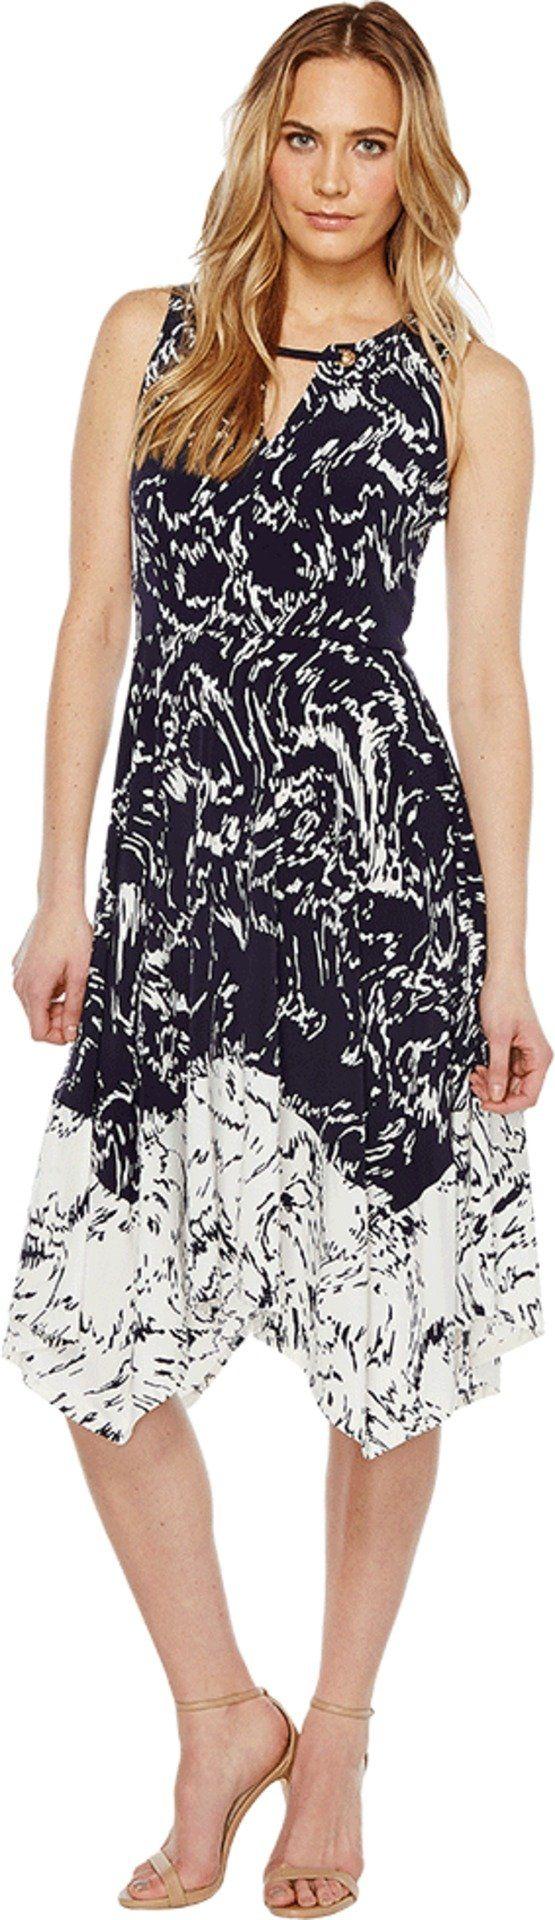 Ivanka Trump Women's Printed Matte Jersey with Handkerchief Hem Navy/Ivory Dress